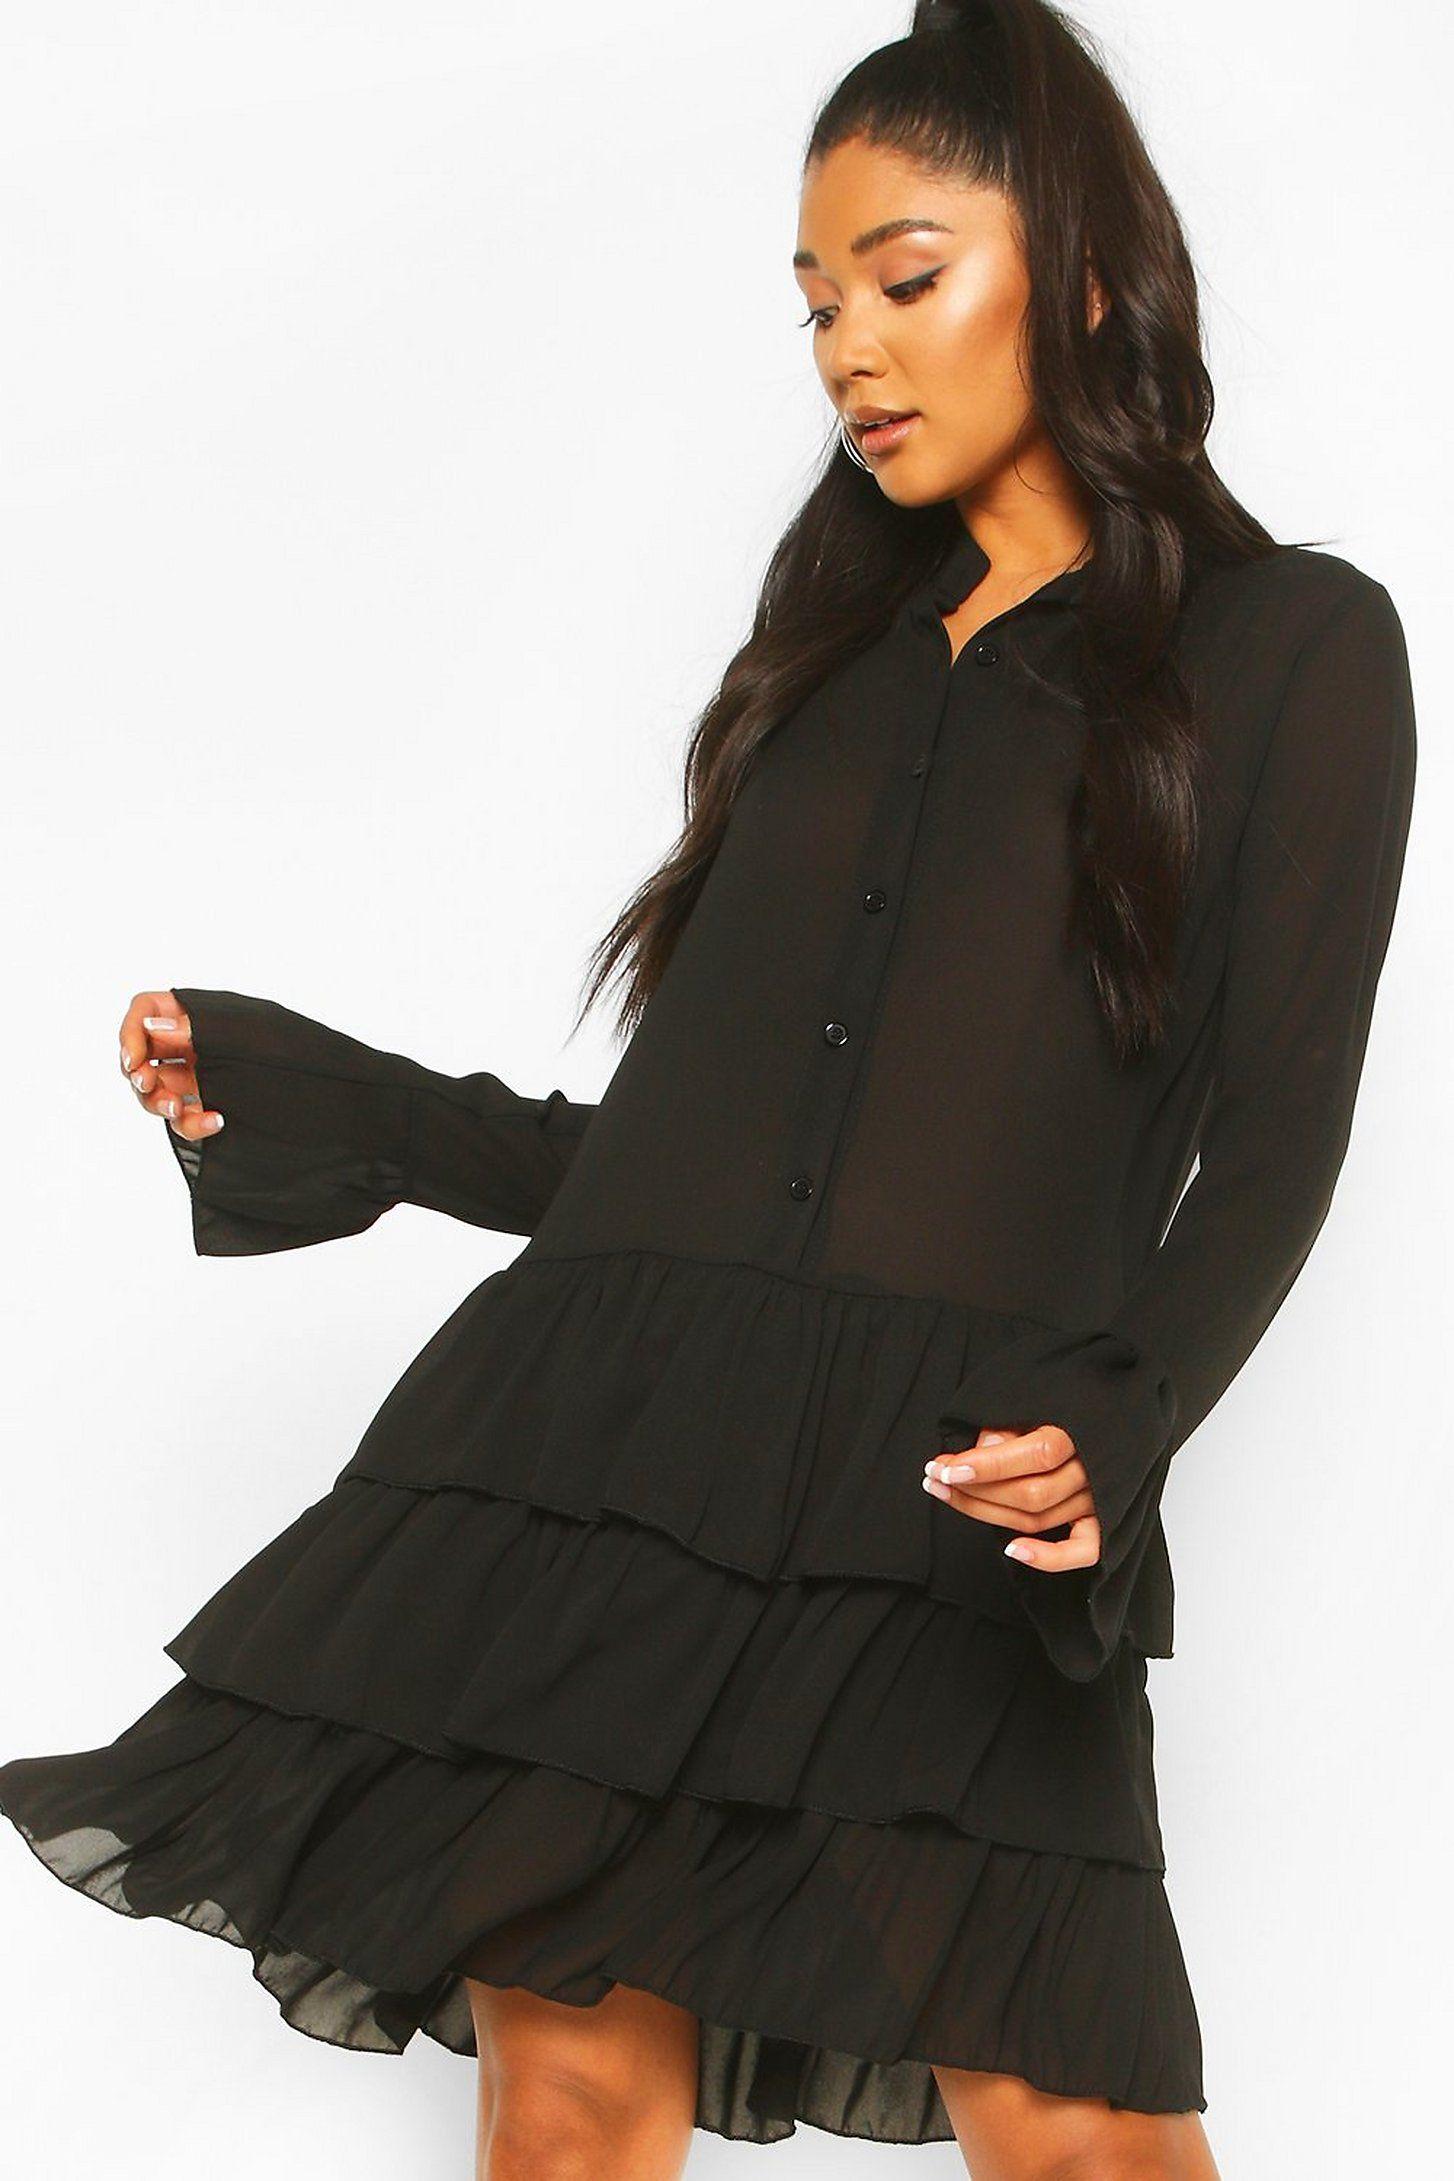 Ruffle Hem Shirt Dress Boohoo Dresses Dress Shirts For Women Ruffle Hem Shirt [ 2181 x 1454 Pixel ]